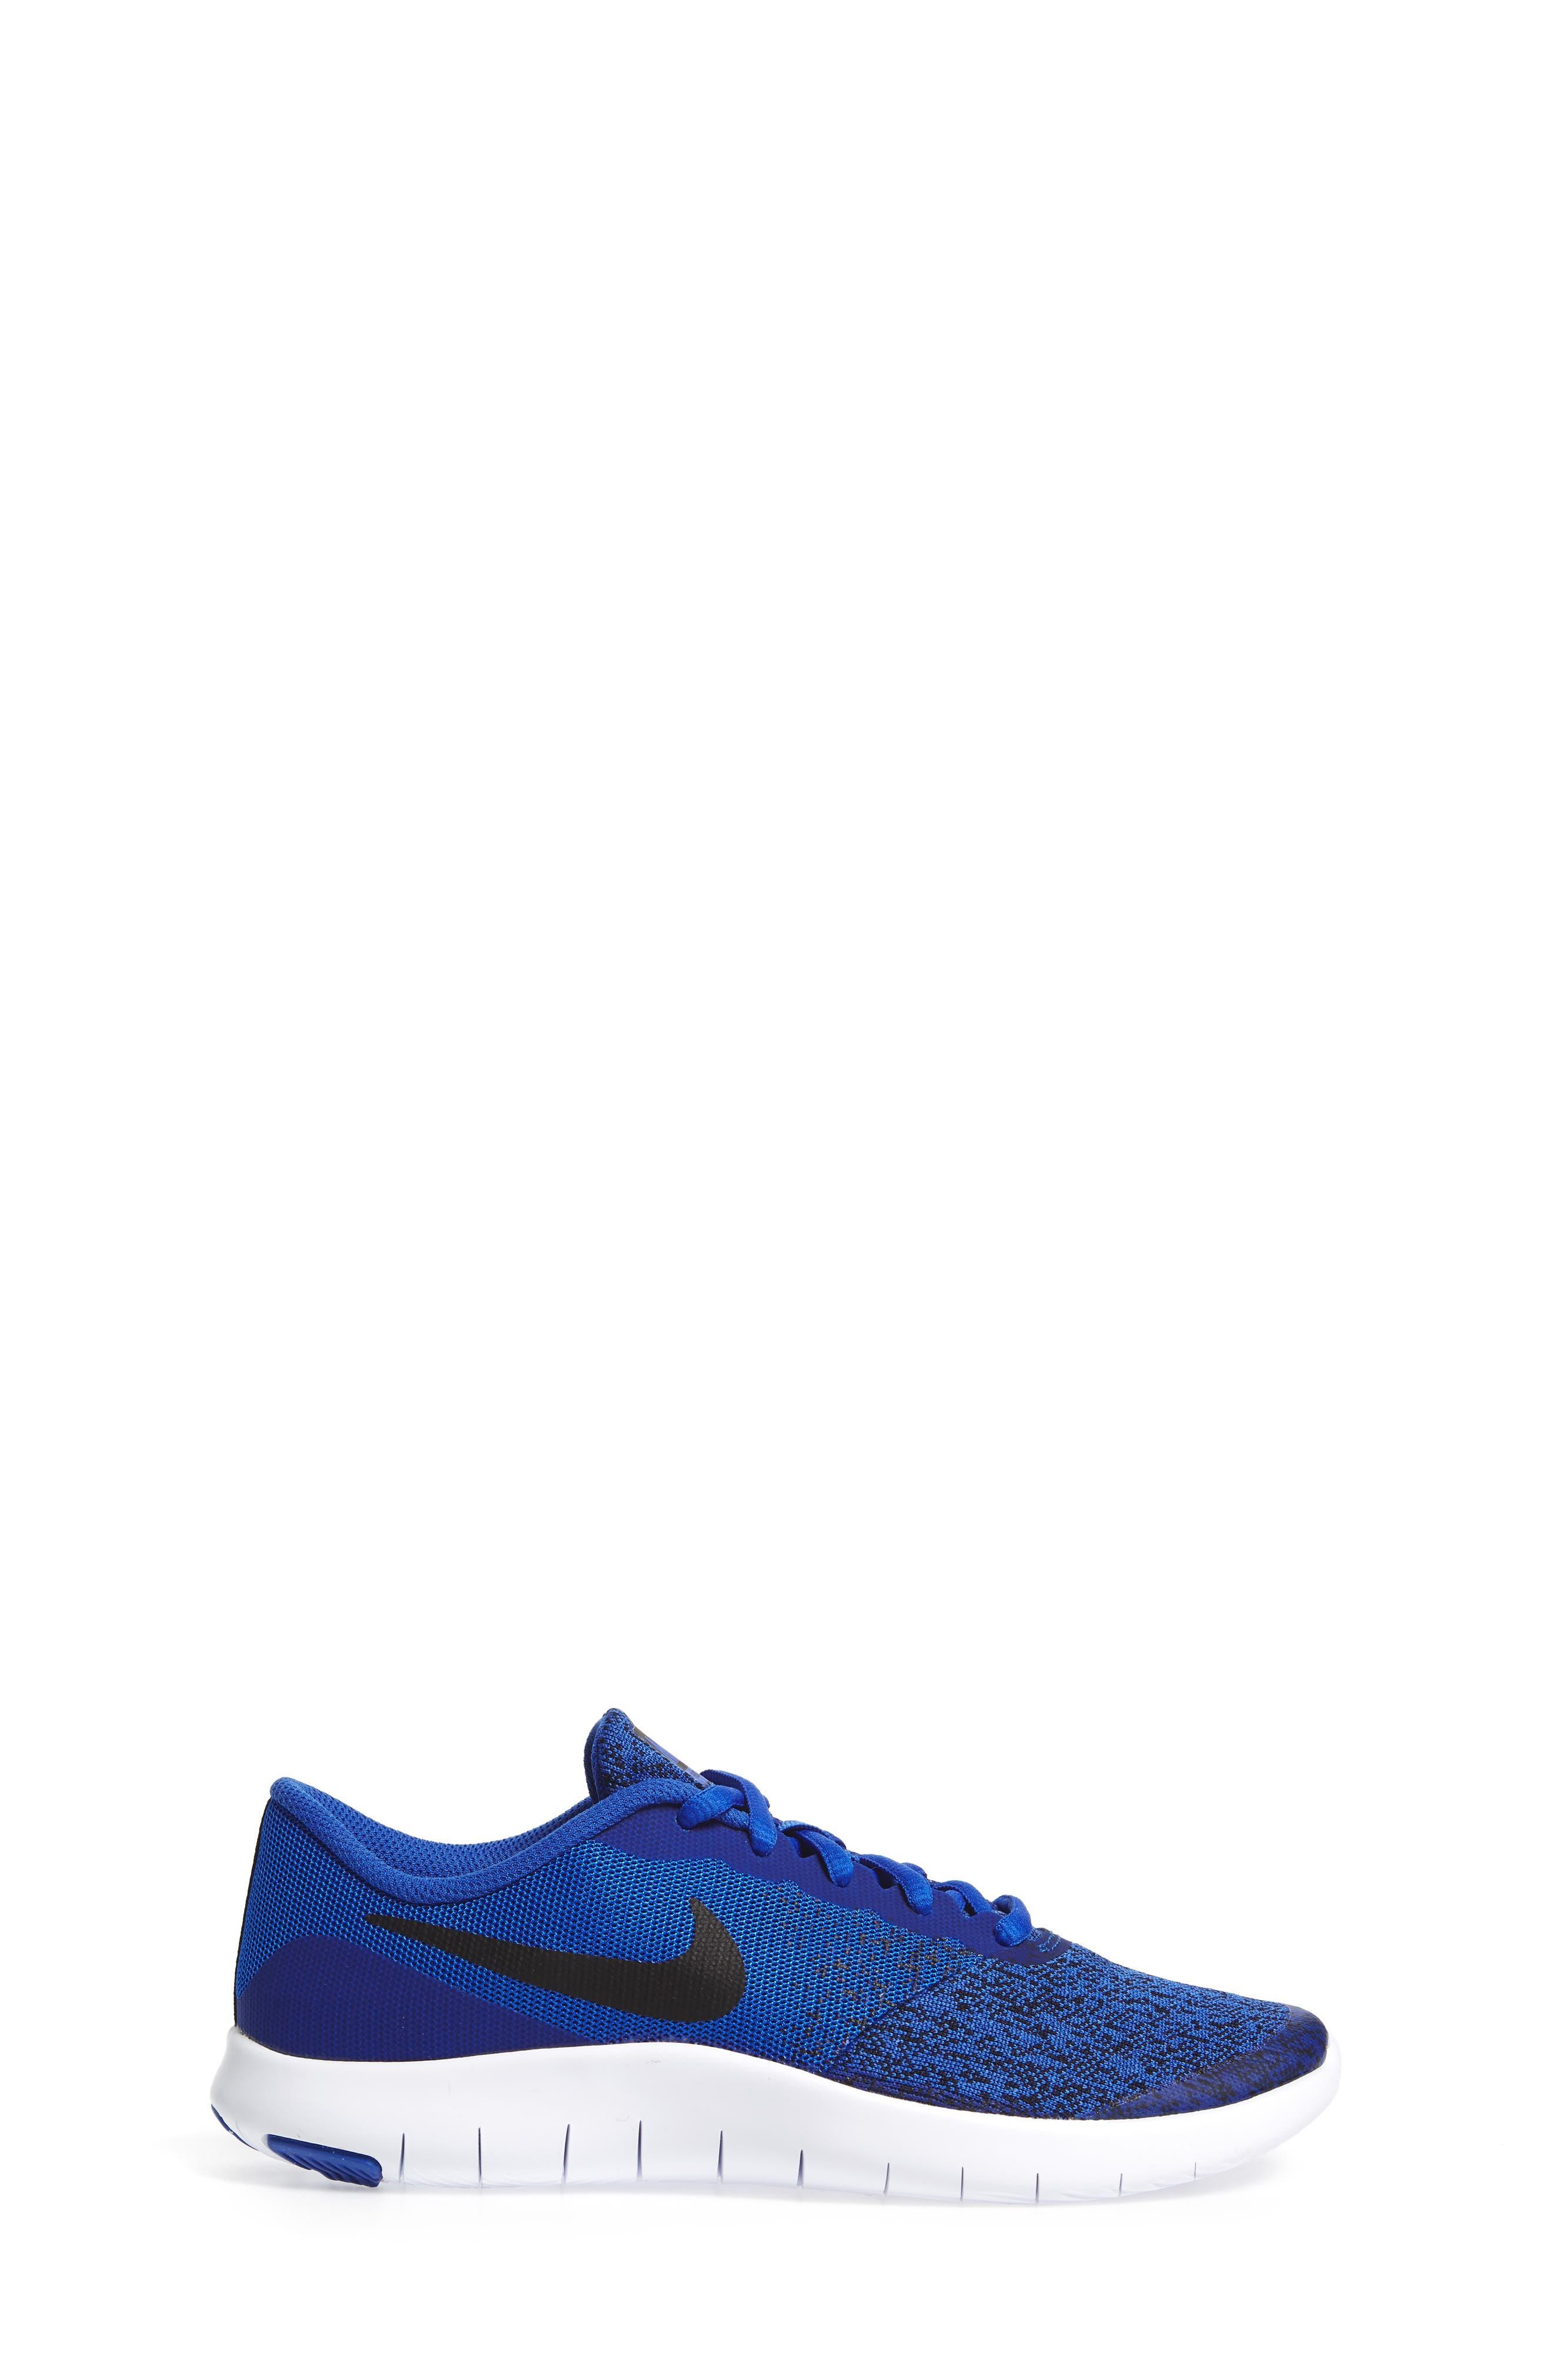 Flex Contact Running Shoe,                             Alternate thumbnail 16, color,